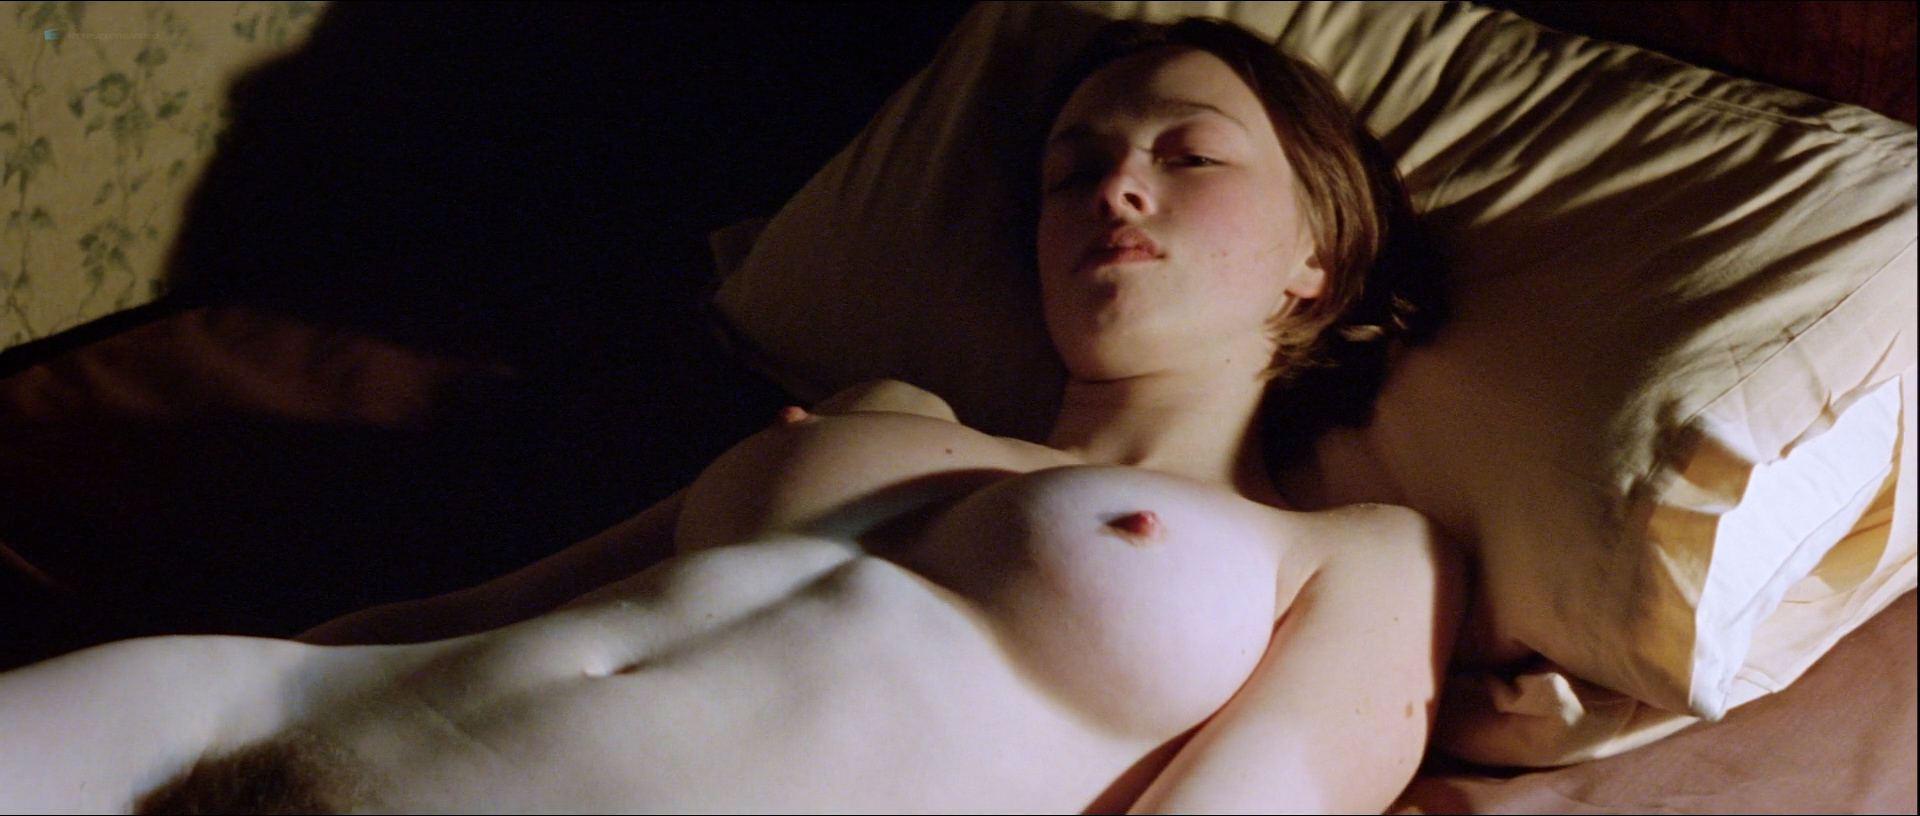 0919023556012_08_Lara-Belmont-nude-bush-and-topless-Tilda-Swinton-Aisling-O_Sullivan-nude-too-The-War-Zone-1999-HD-1080p-Web-010.jpg